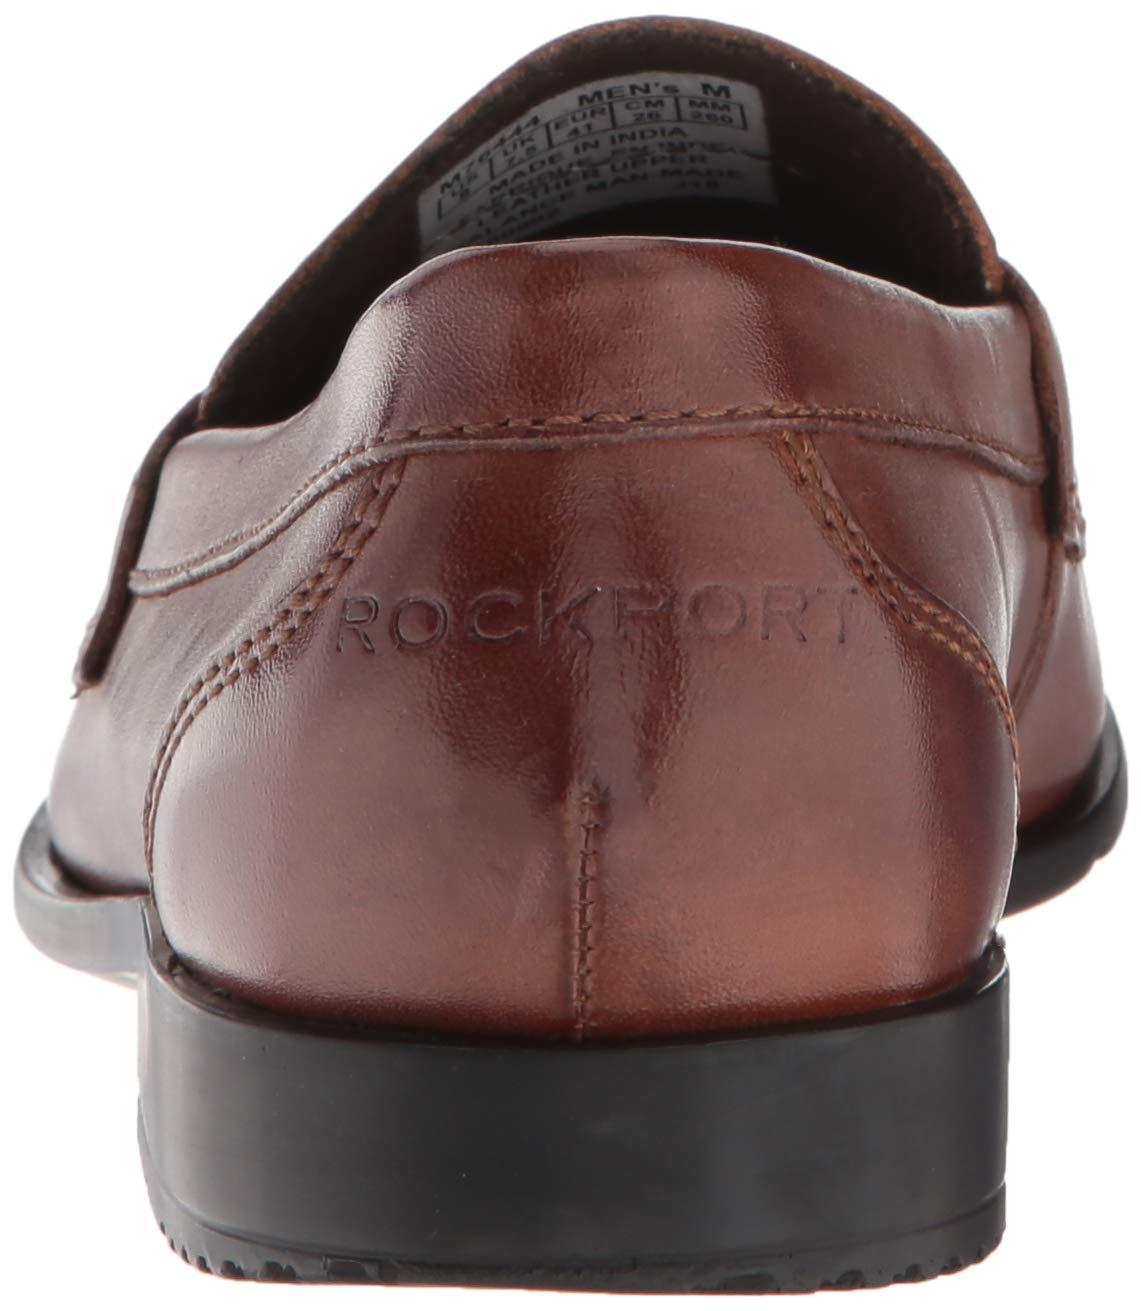 Rockport Men's Classic Lite Penny Loafer, Cognac, - Choose ...